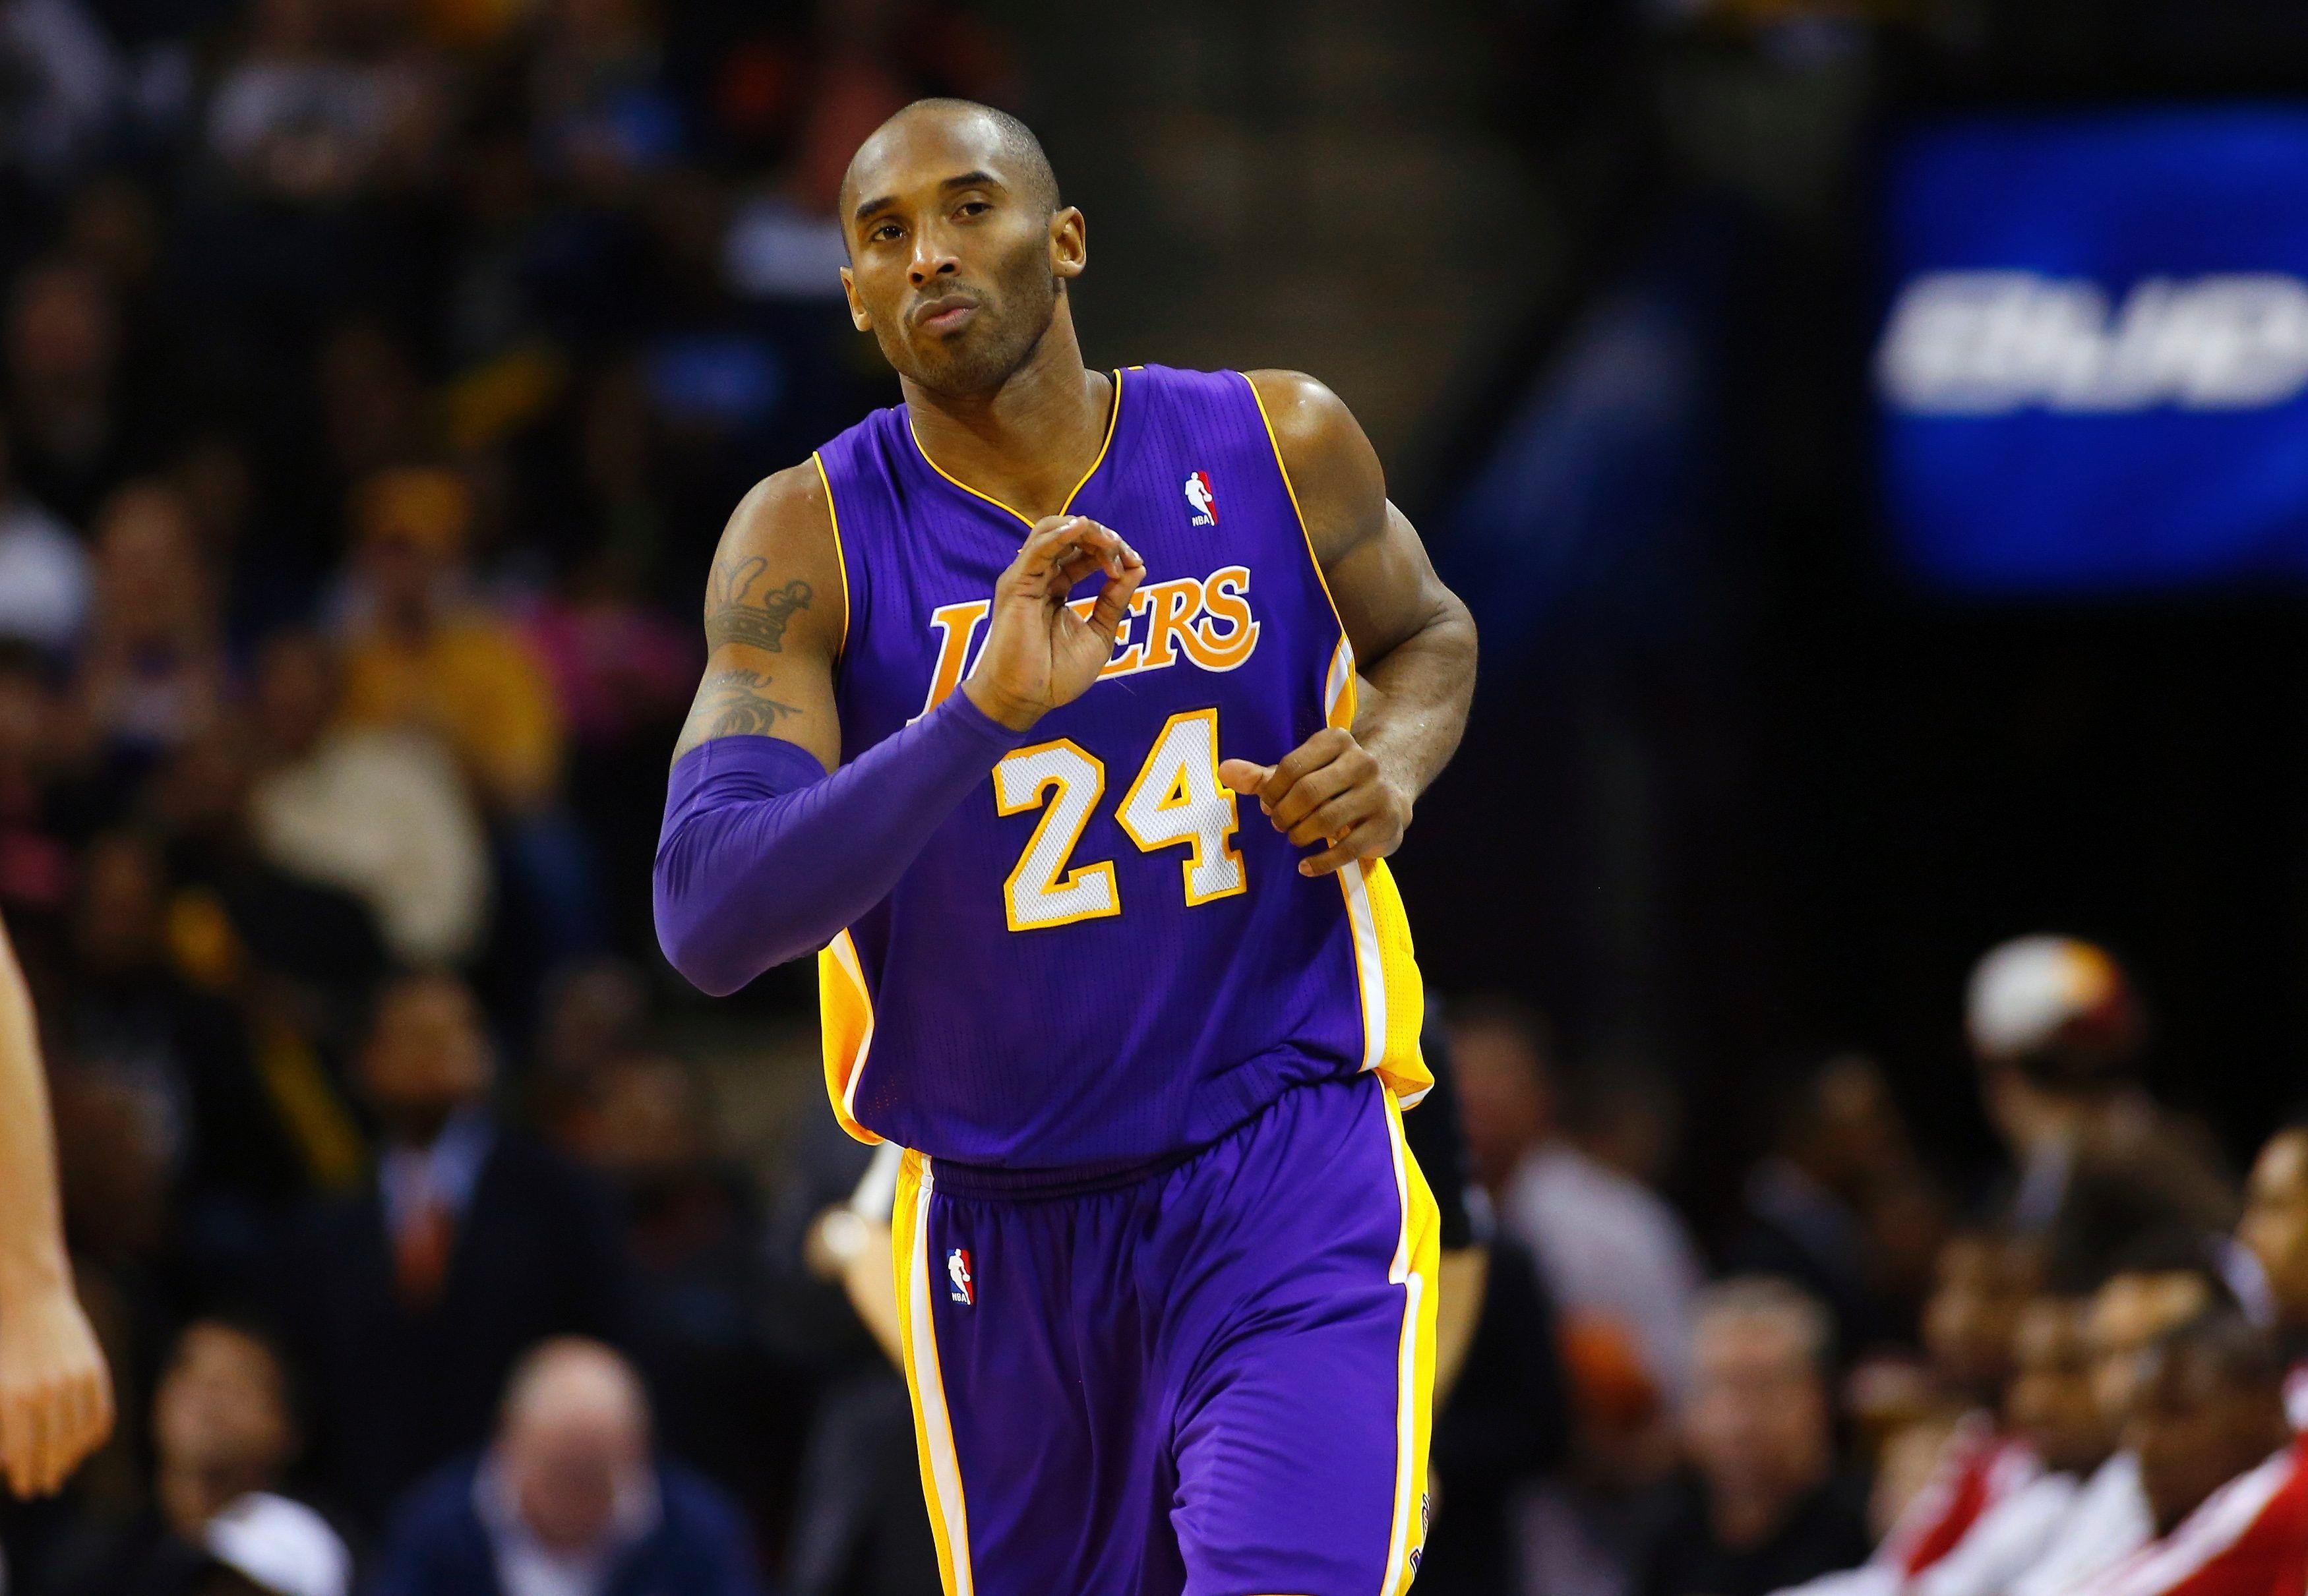 Home Sports News Scores Schedules Videos And Fantasy Games Kobe Bryant Kobe Bryant